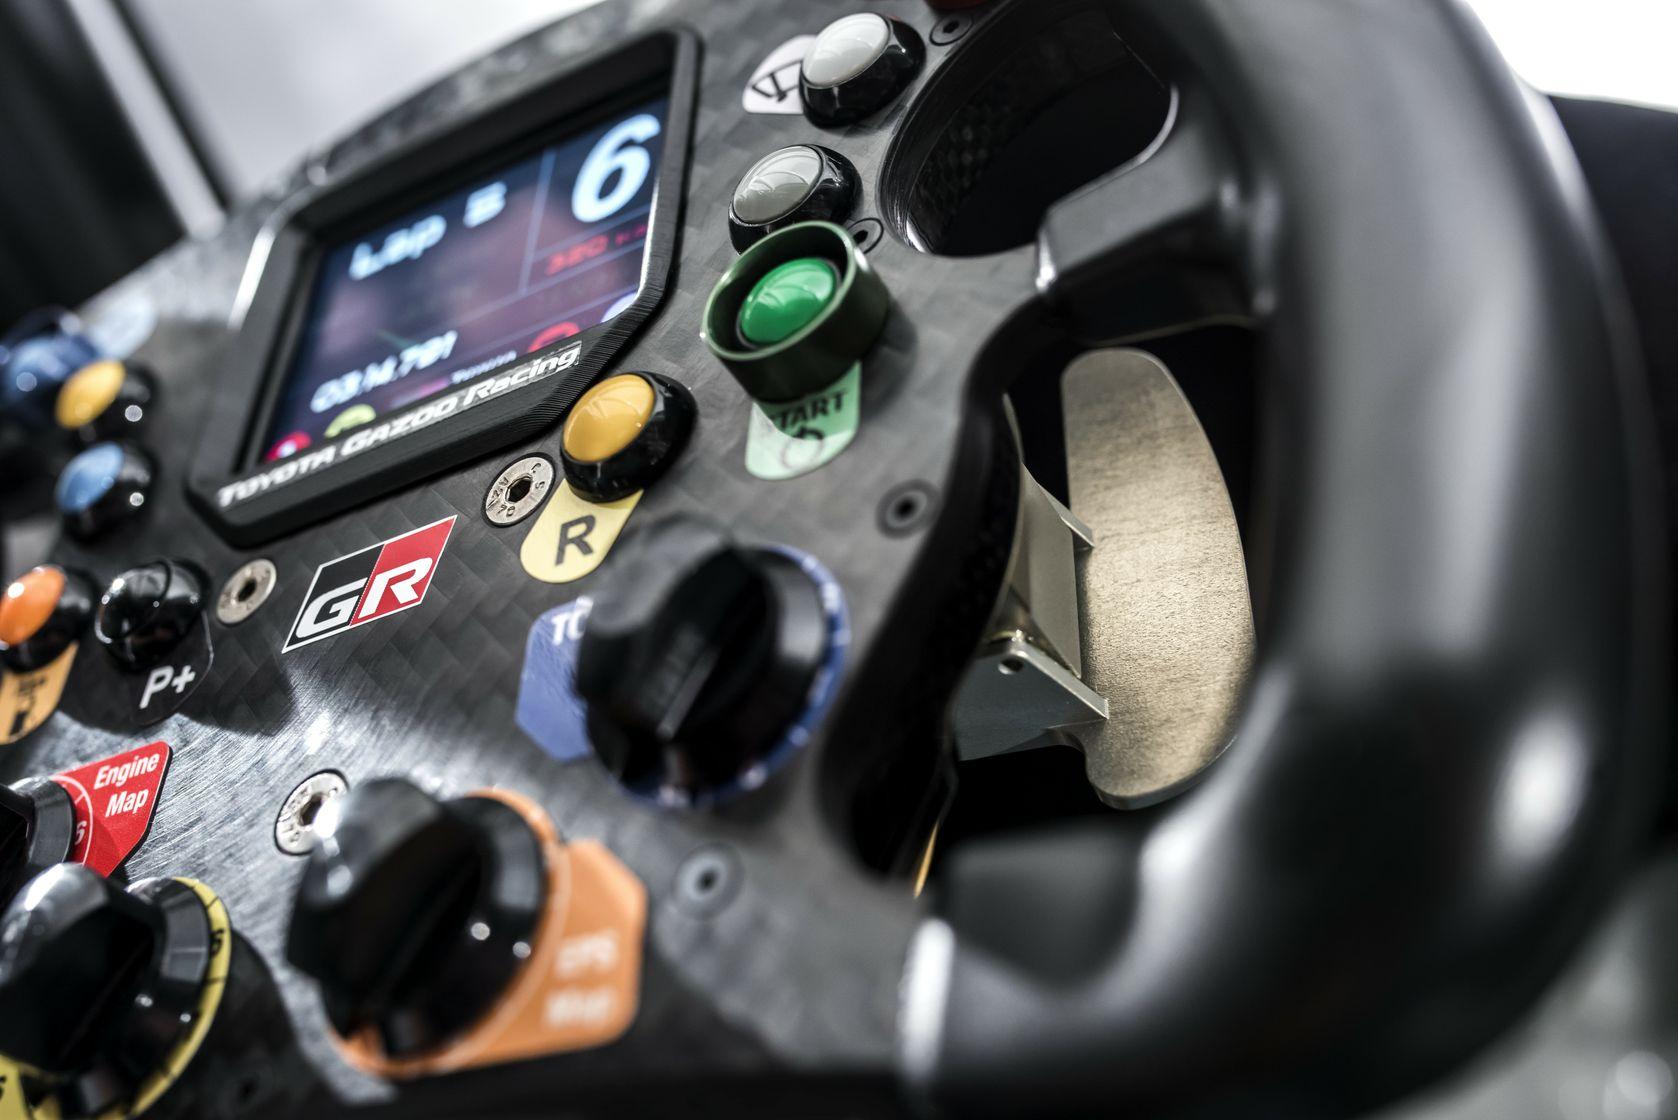 GR Supra Racing Concept - Interior Details - 05